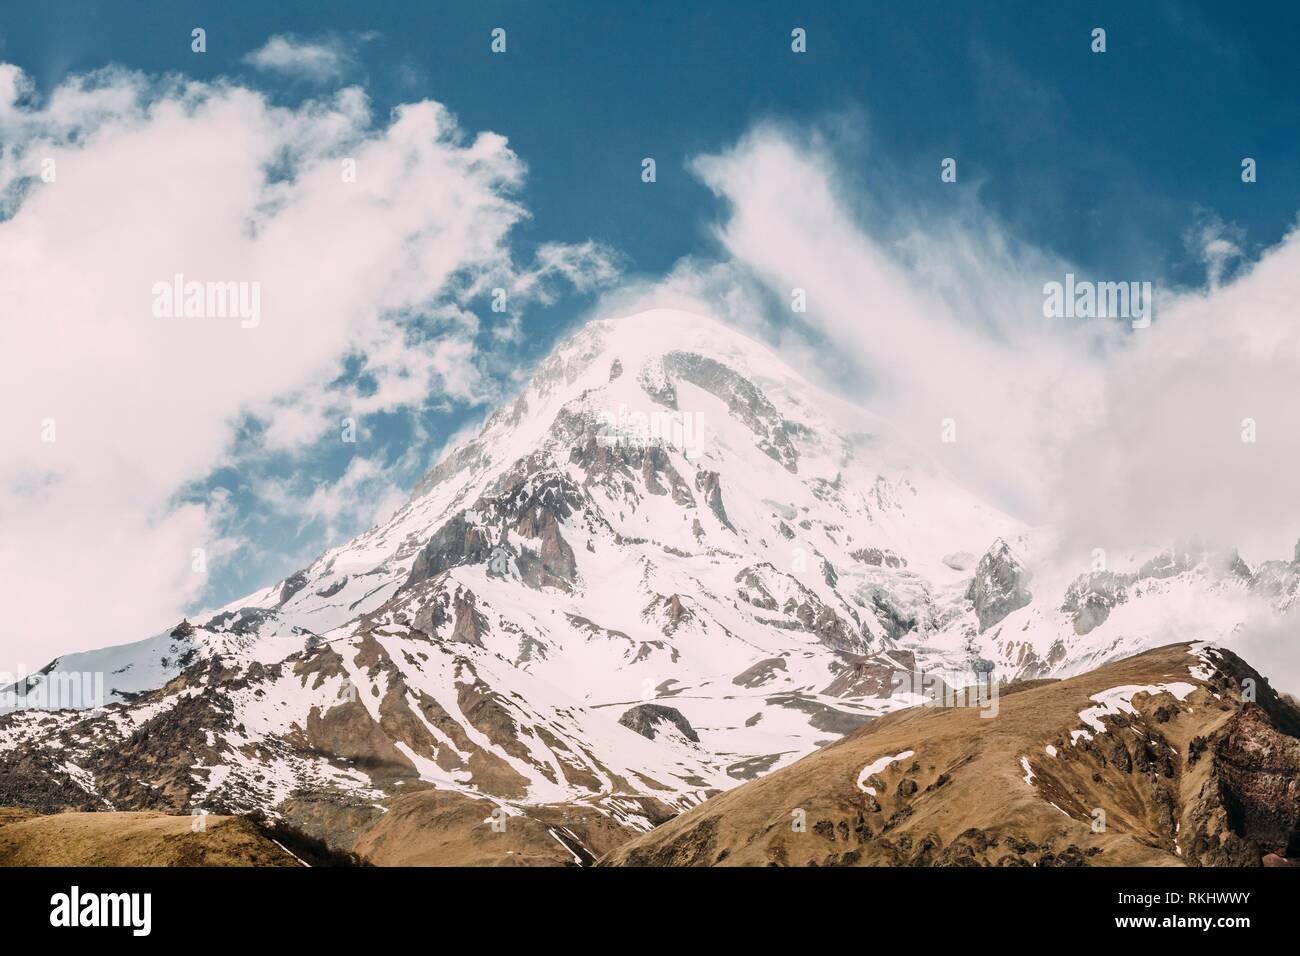 Peak Of Mount Kazbek Covered With Snow. Kazbek Is A Stratovolcano And One Of Major Mountains Of Caucasus Located On Border Of Georgia's Kazbegi - Stock Image